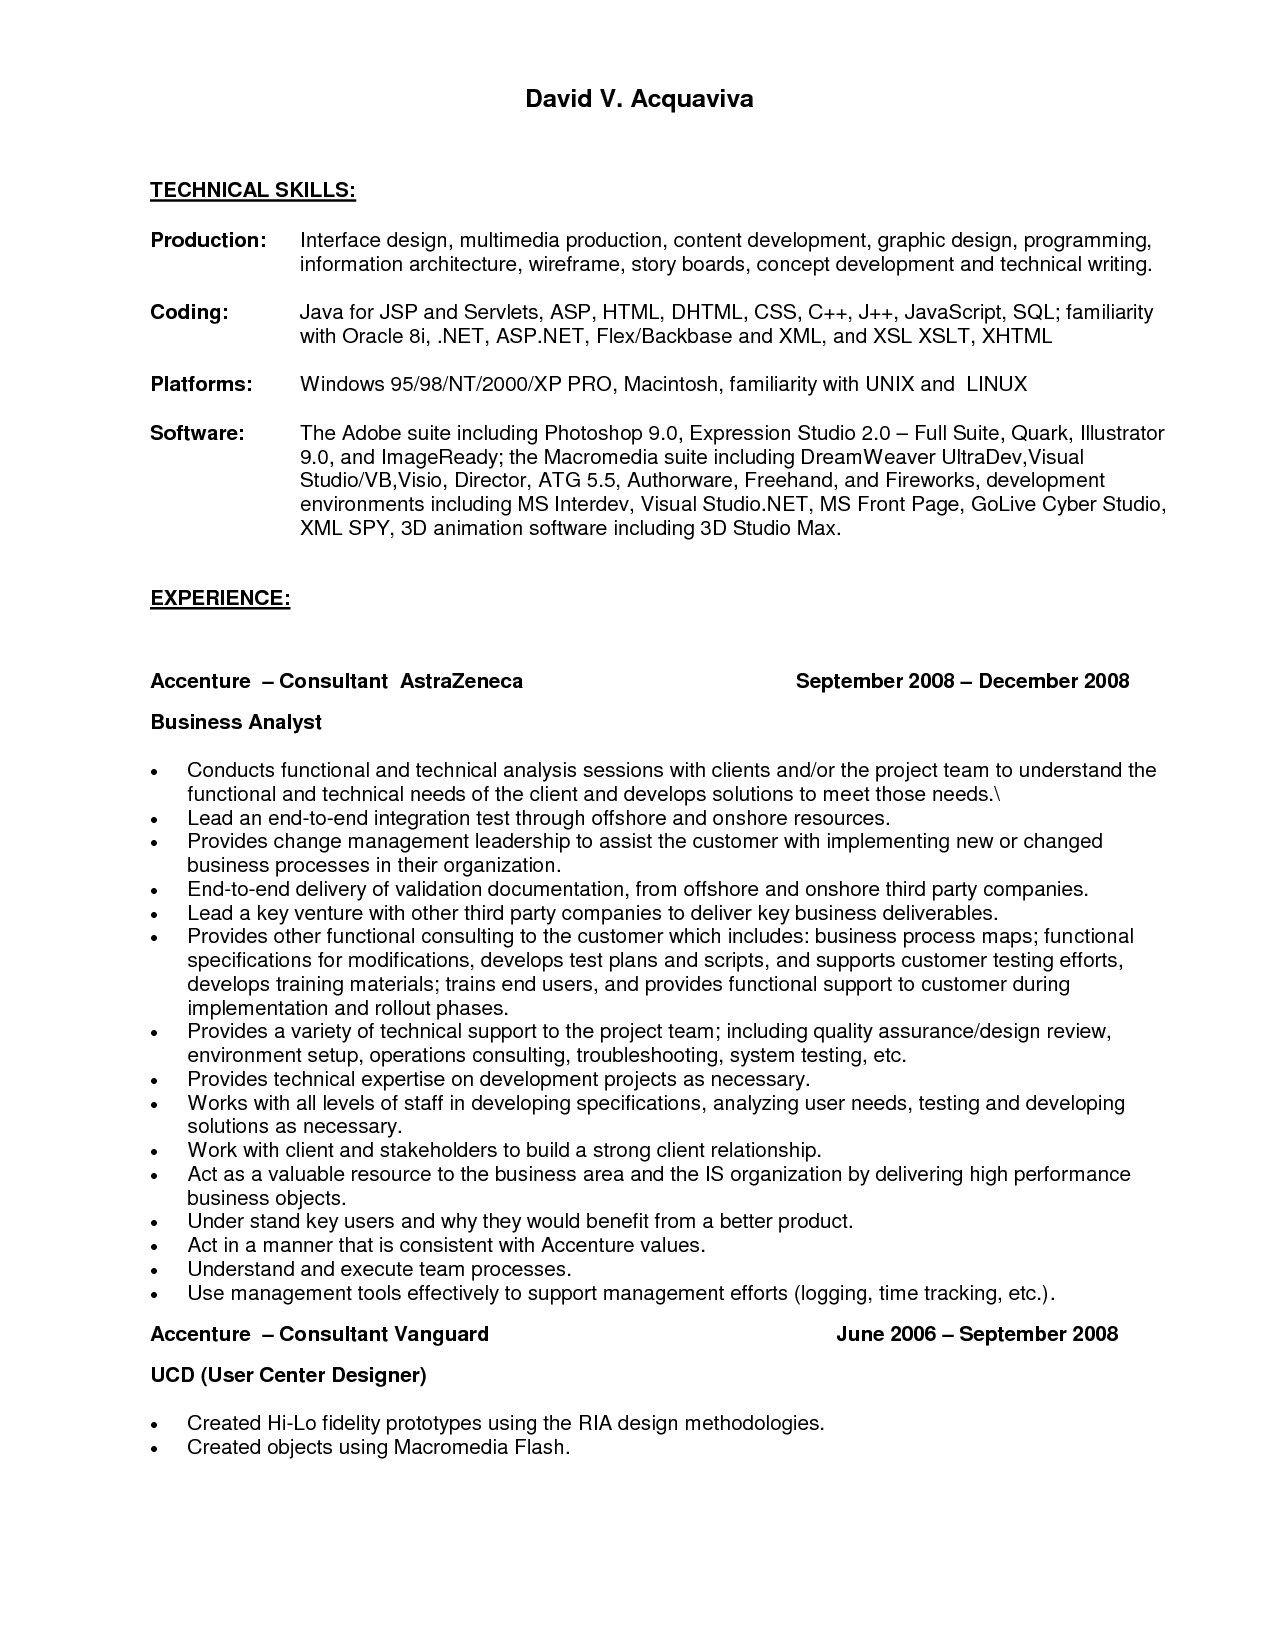 accenture resume examples - Koran.ayodhya.co